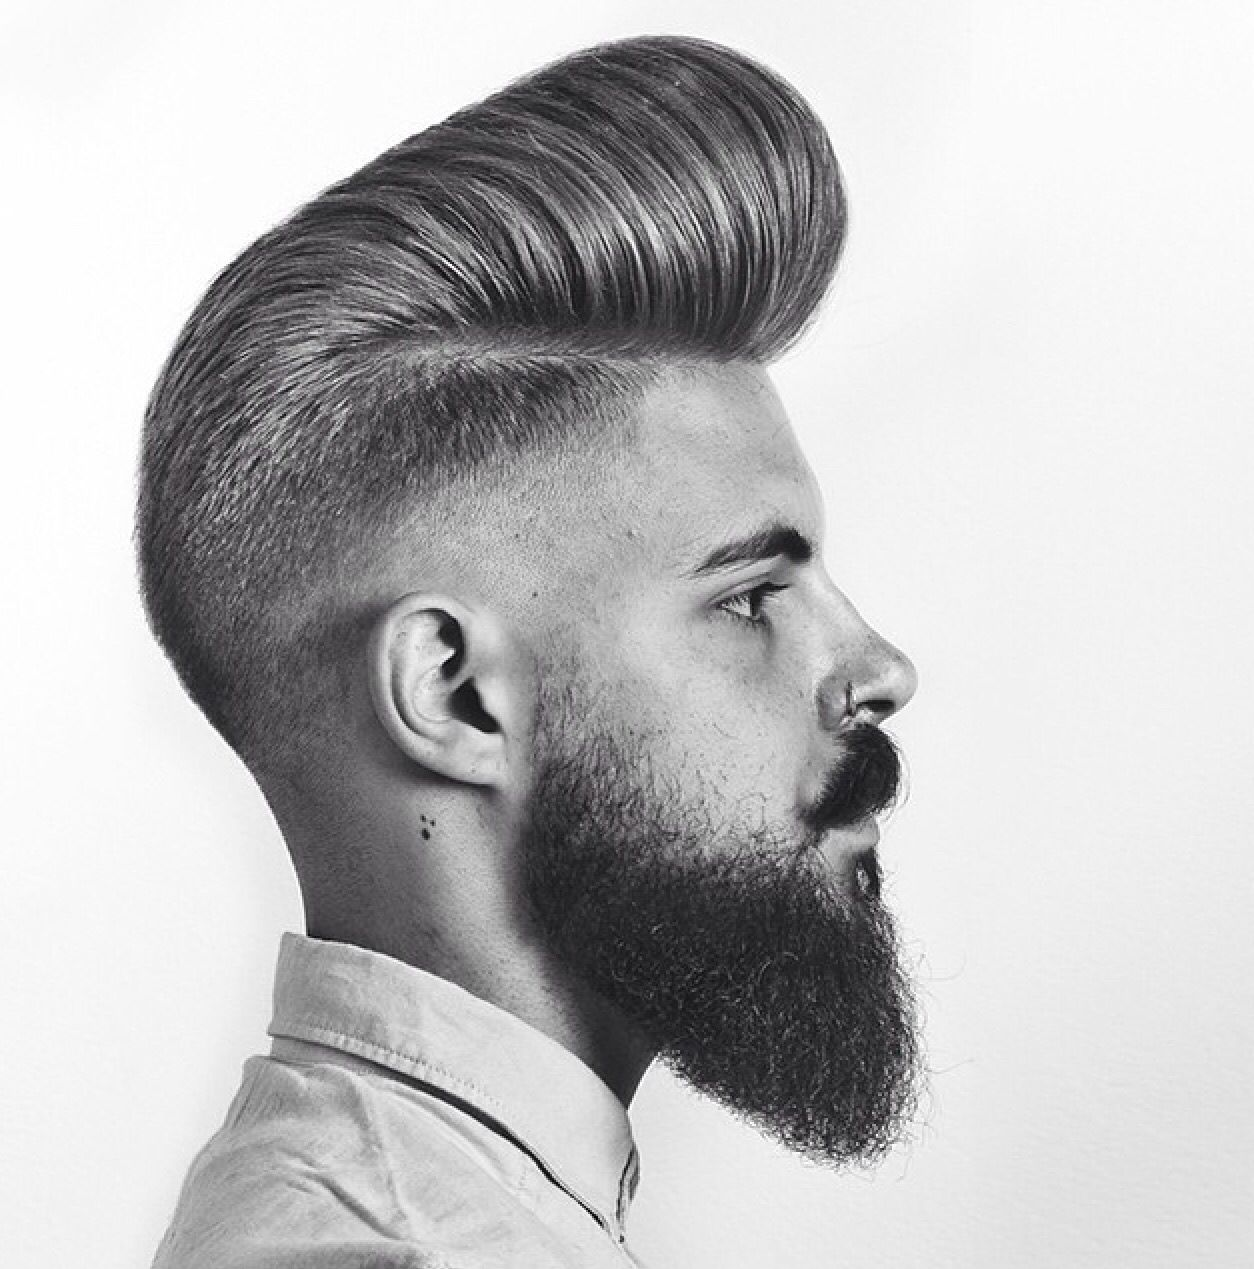 Source Schorem Haarsnijder En Barbier Facebook Com Schorem Men S Haircut Herenkapsels Mannenkapsels Heren Kapsel